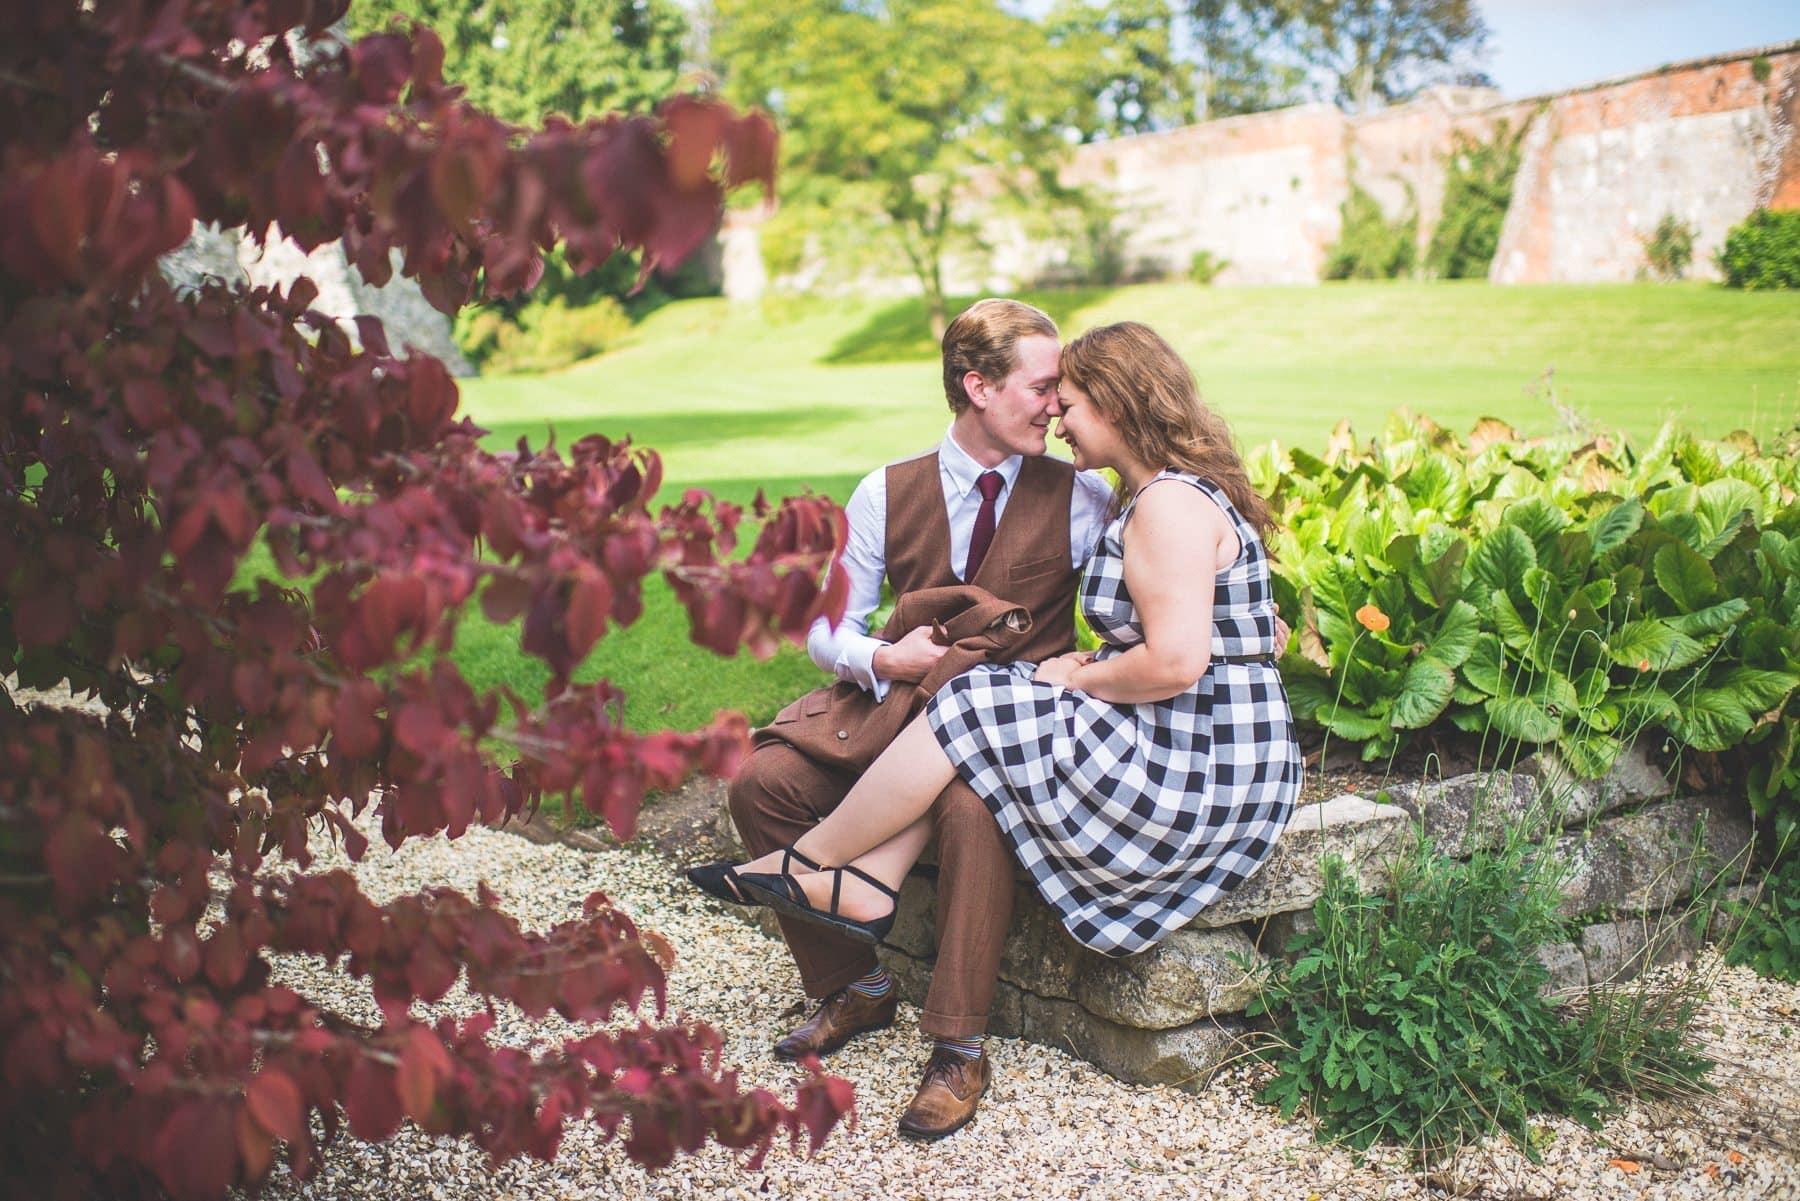 Tweed & Petticoats pre-wedding shoot at Farnham Castle by Maria Assia Photography